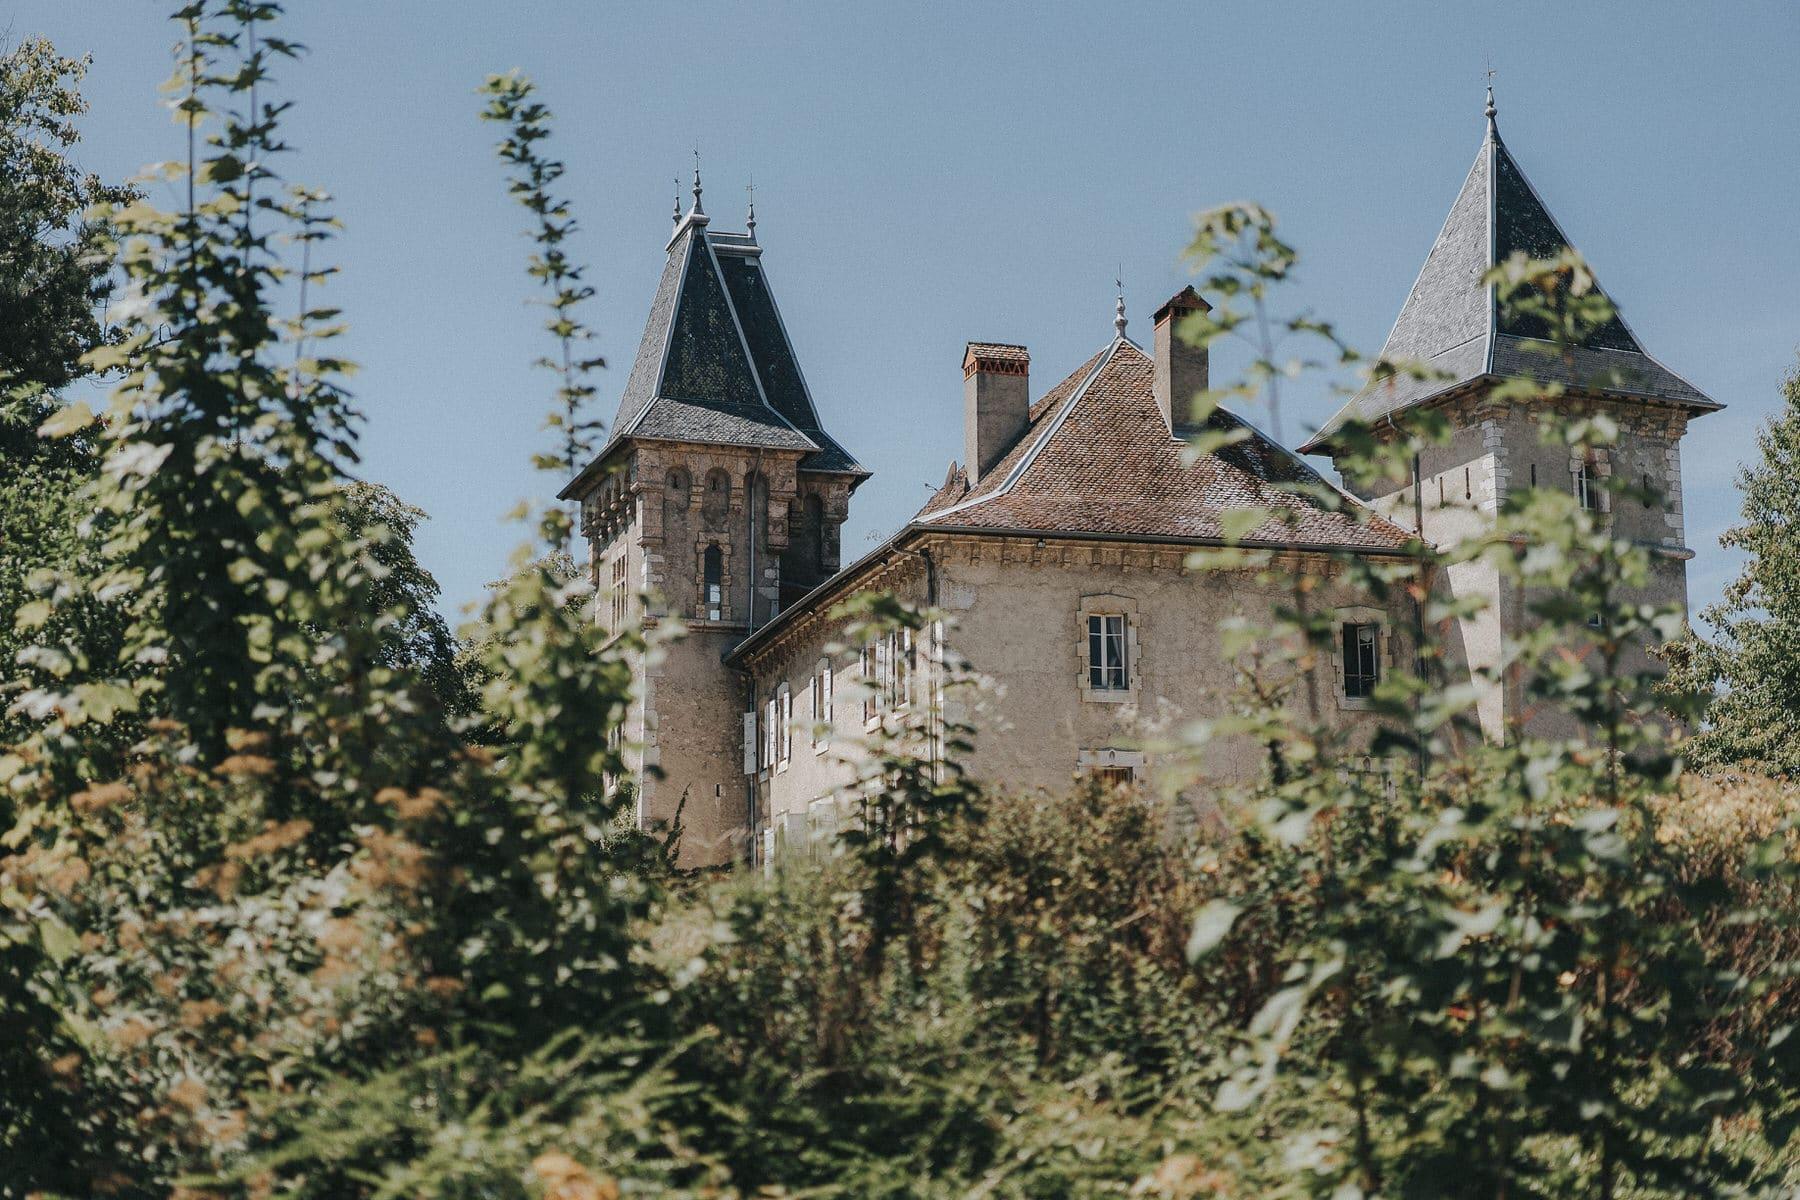 Photographe Mariage Annecy Chateau Saint-sixt